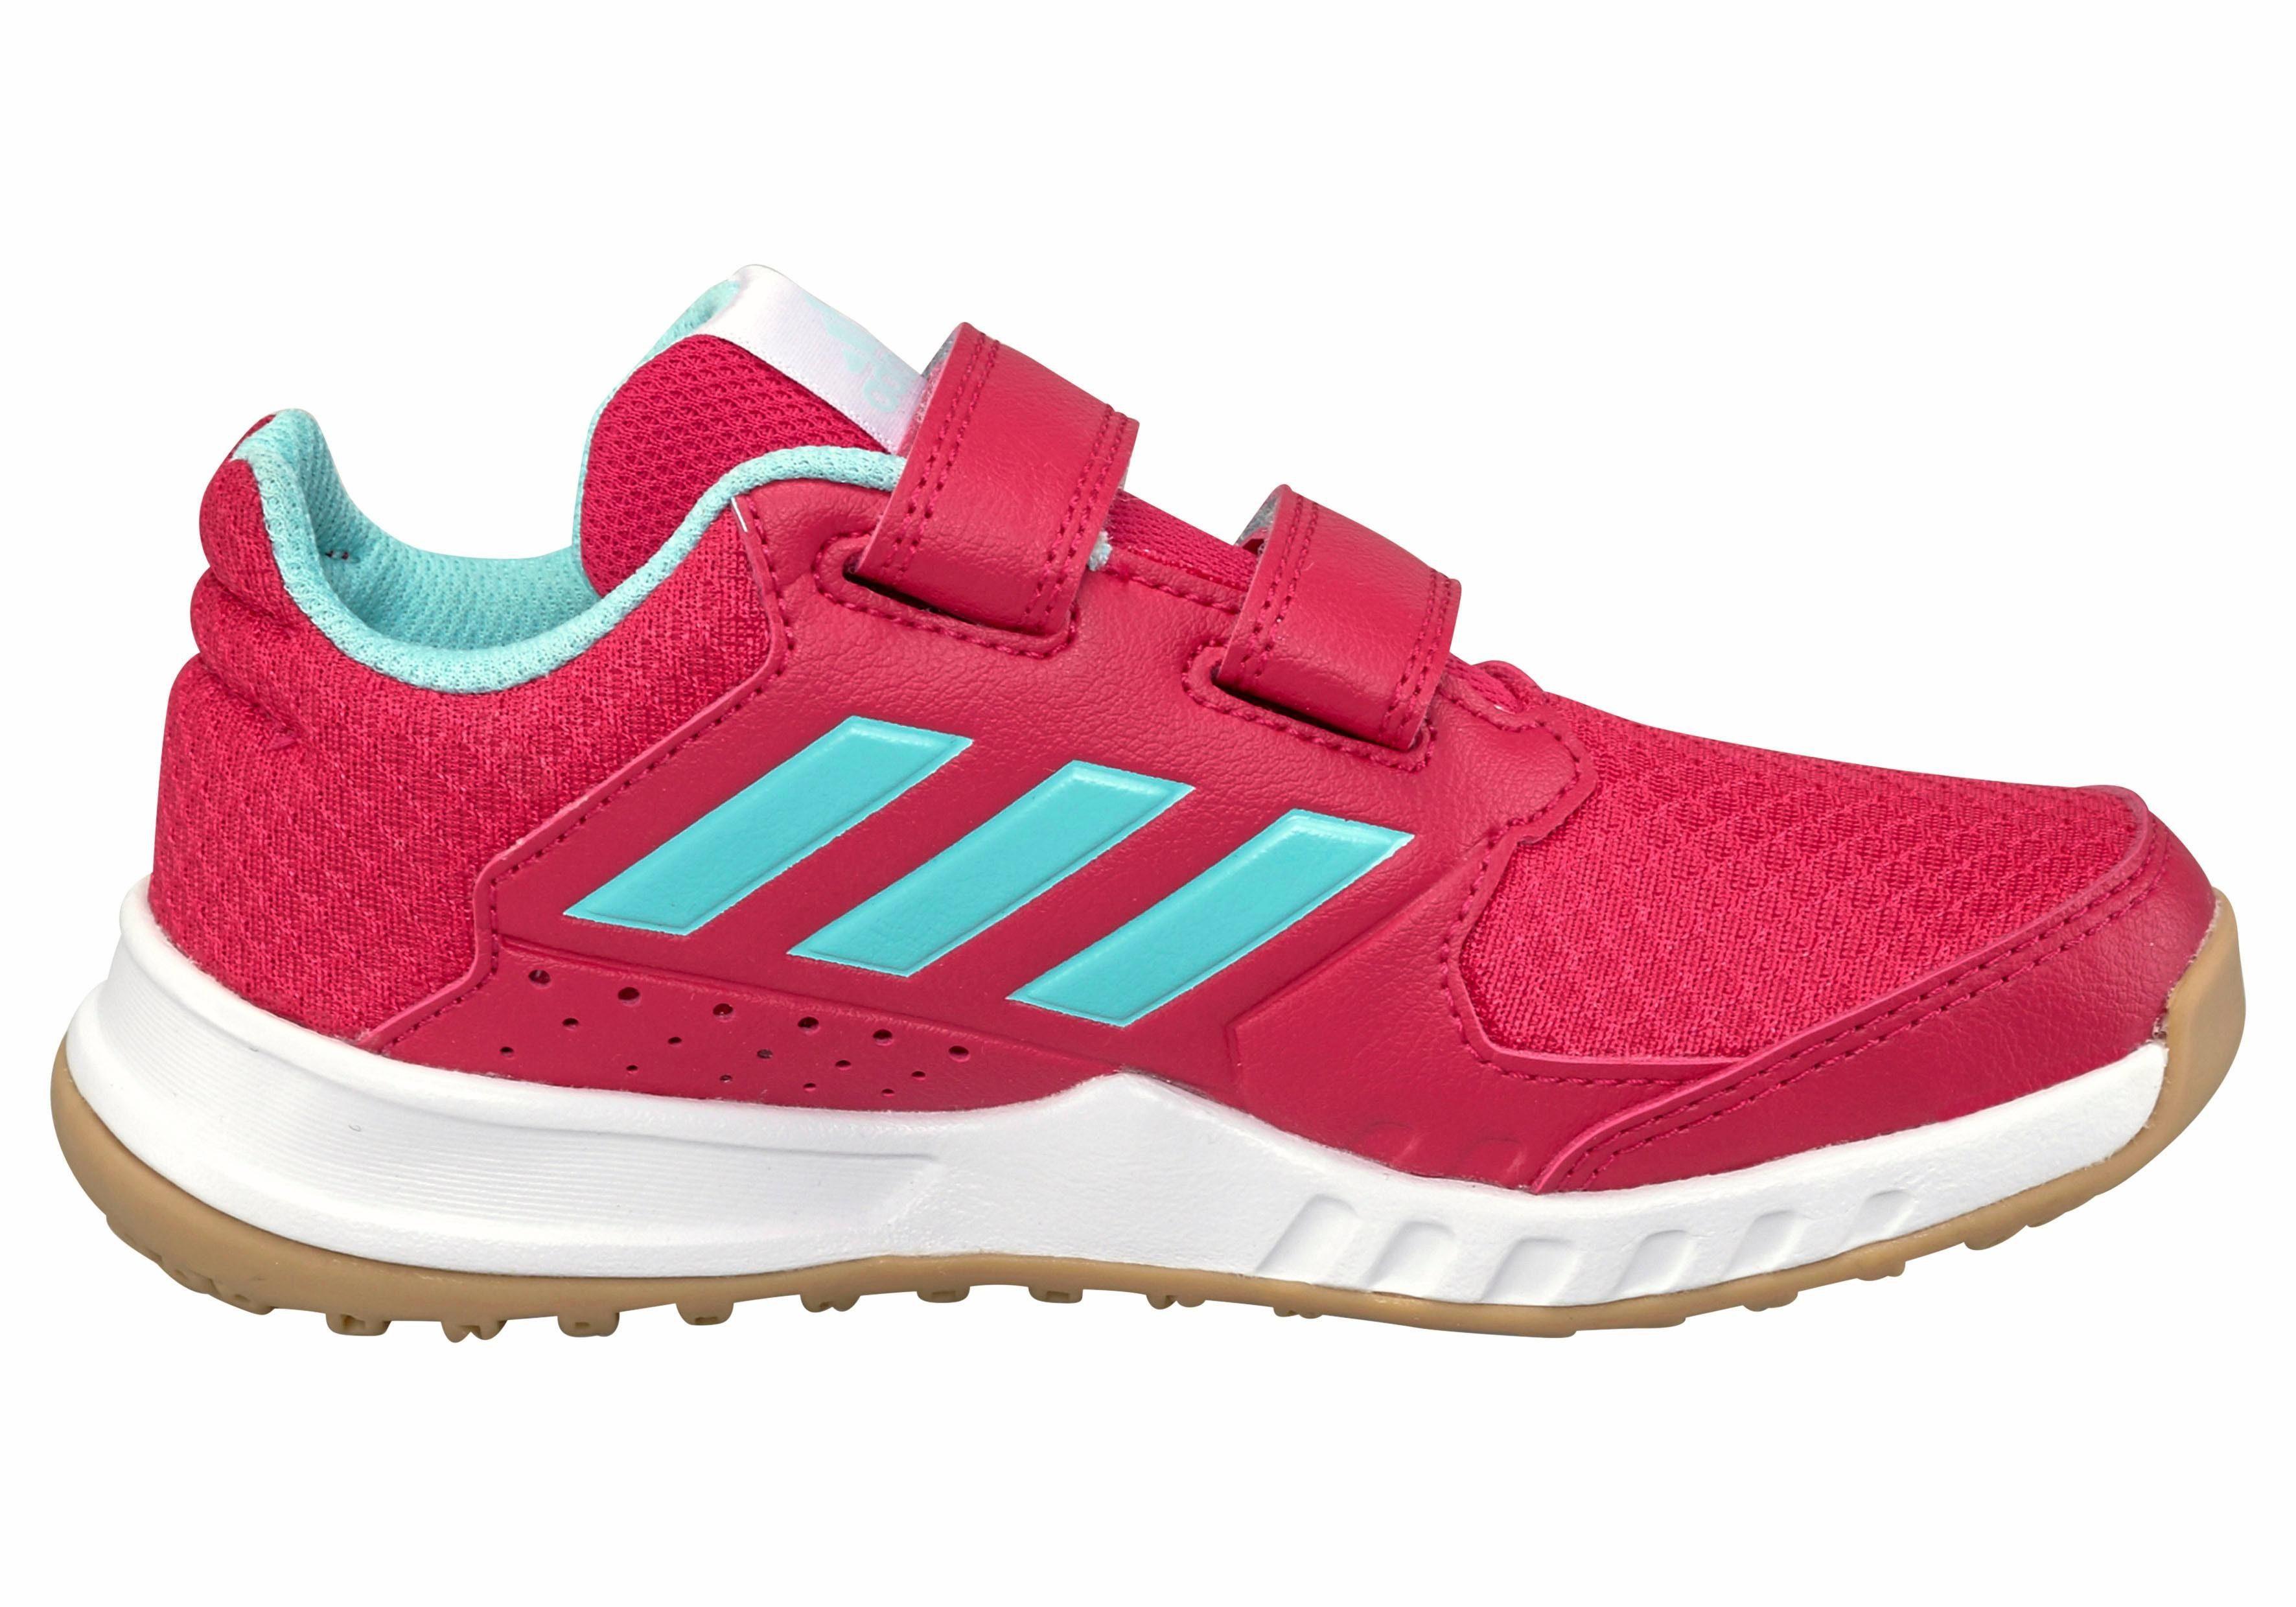 Fortagym Schoenen Adidas iI7DXkK